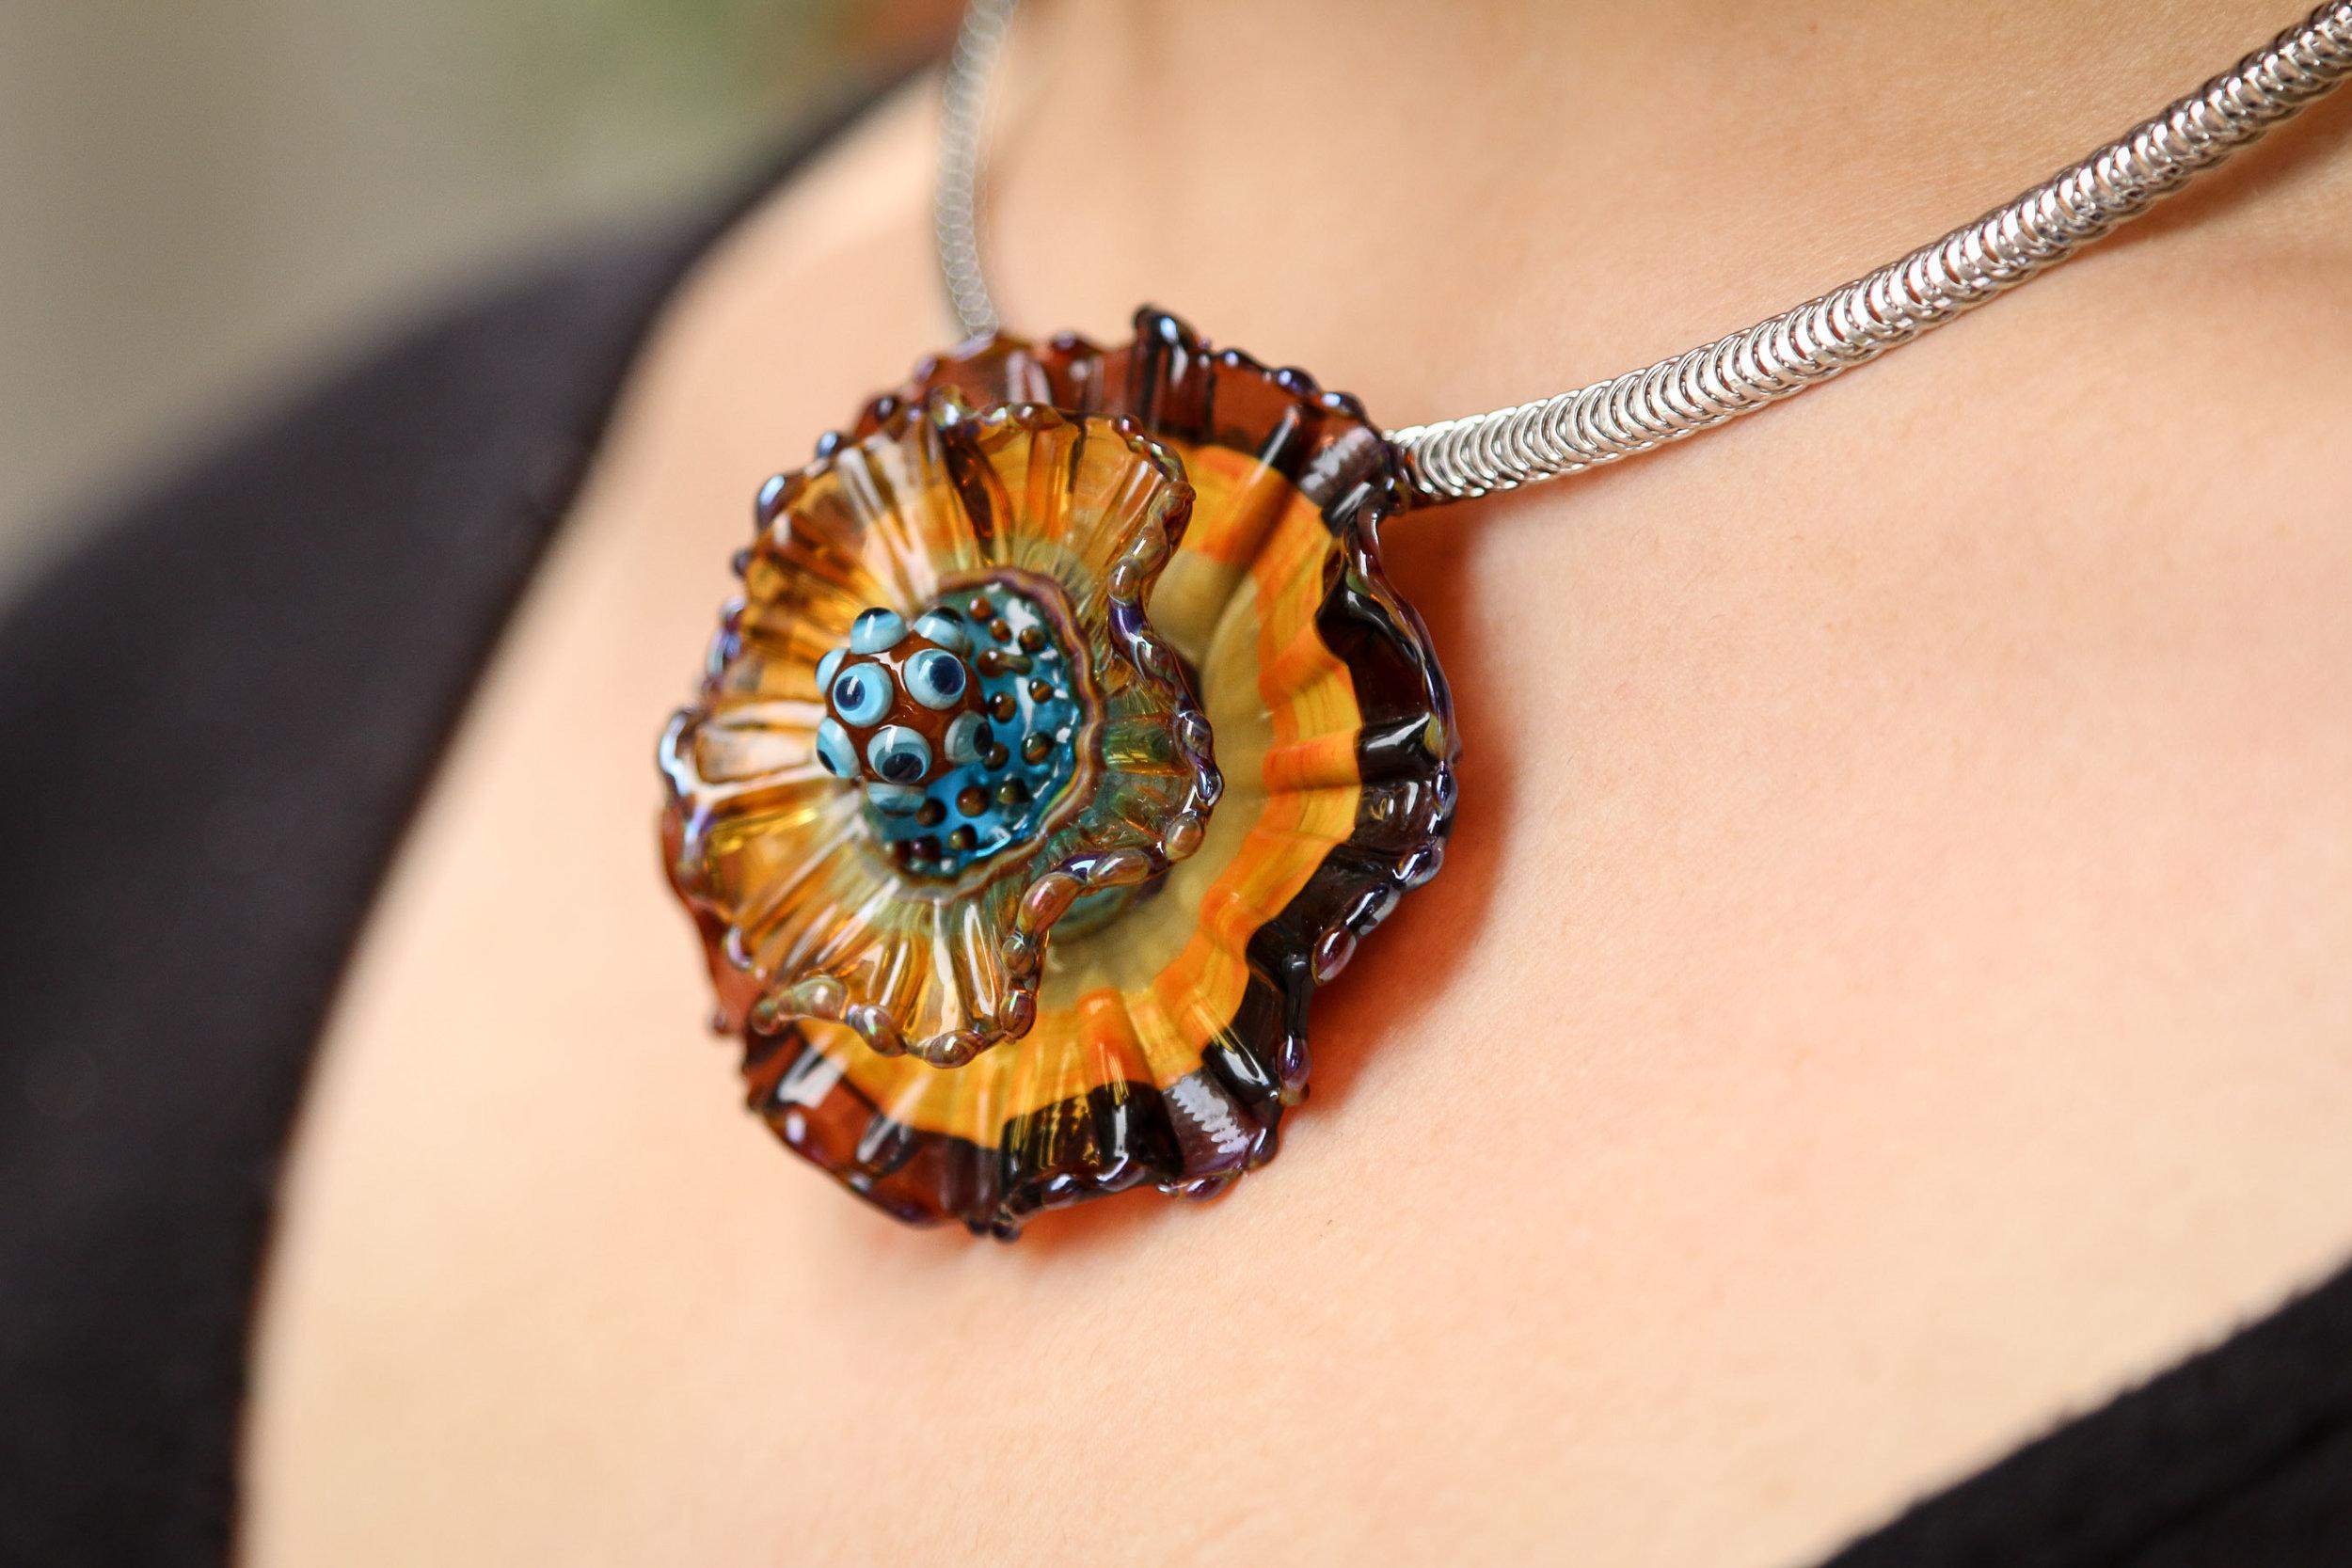 Dark Amber/orange/turquoise Anemone closeup